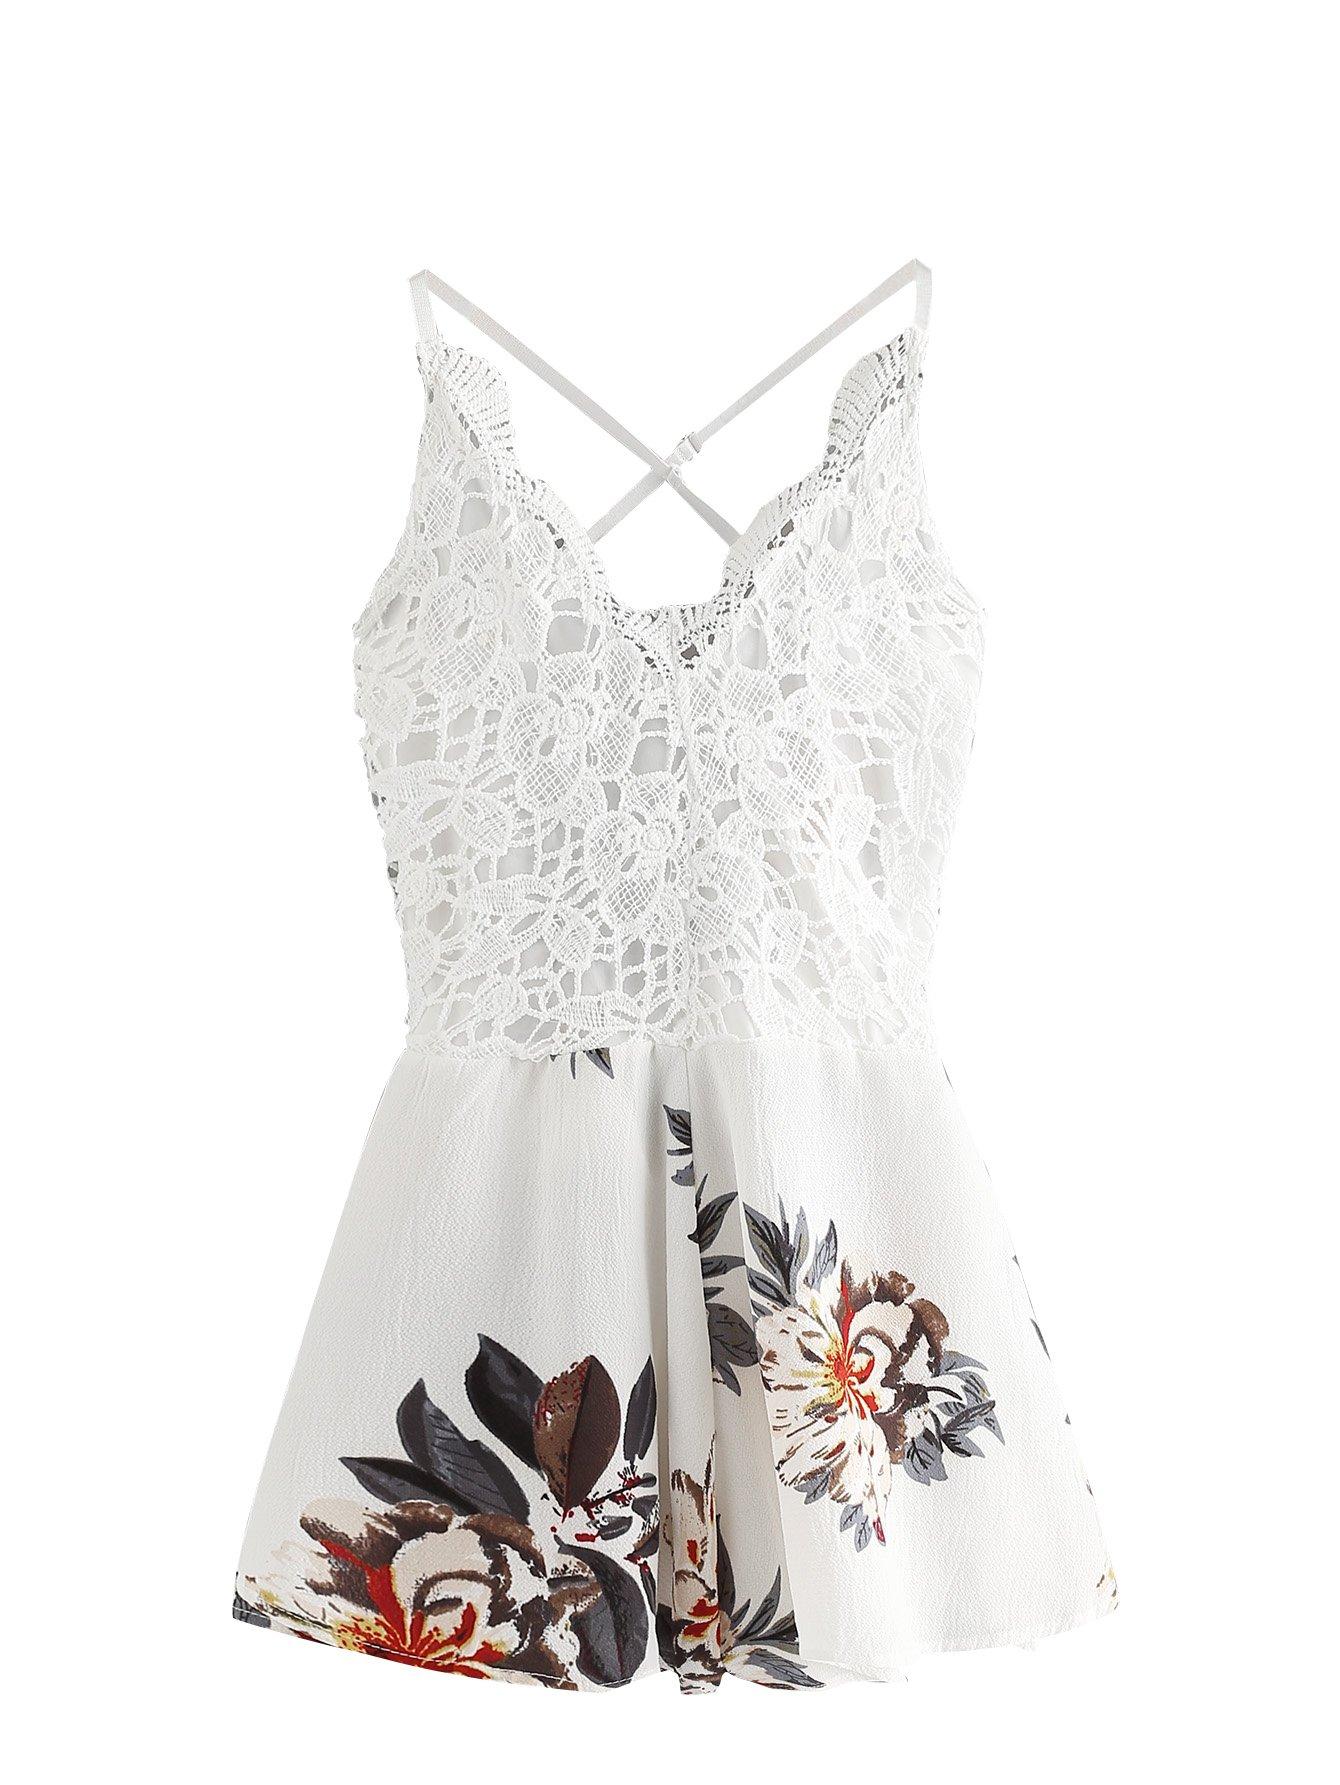 SheIn Women's Boho Crochet V Neck Halter Backless Floral Lace Romper Jumpsuit Large White#2